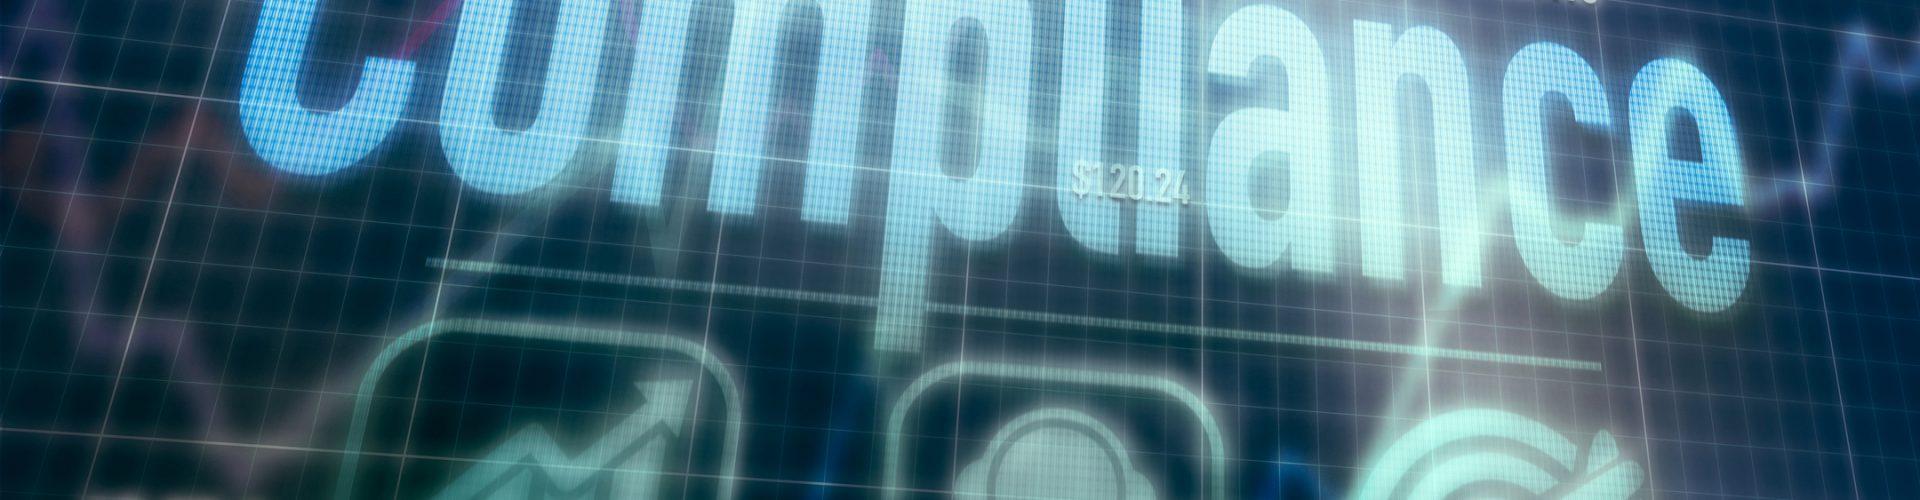 Compliance concept on a blue dot matrix computer display.